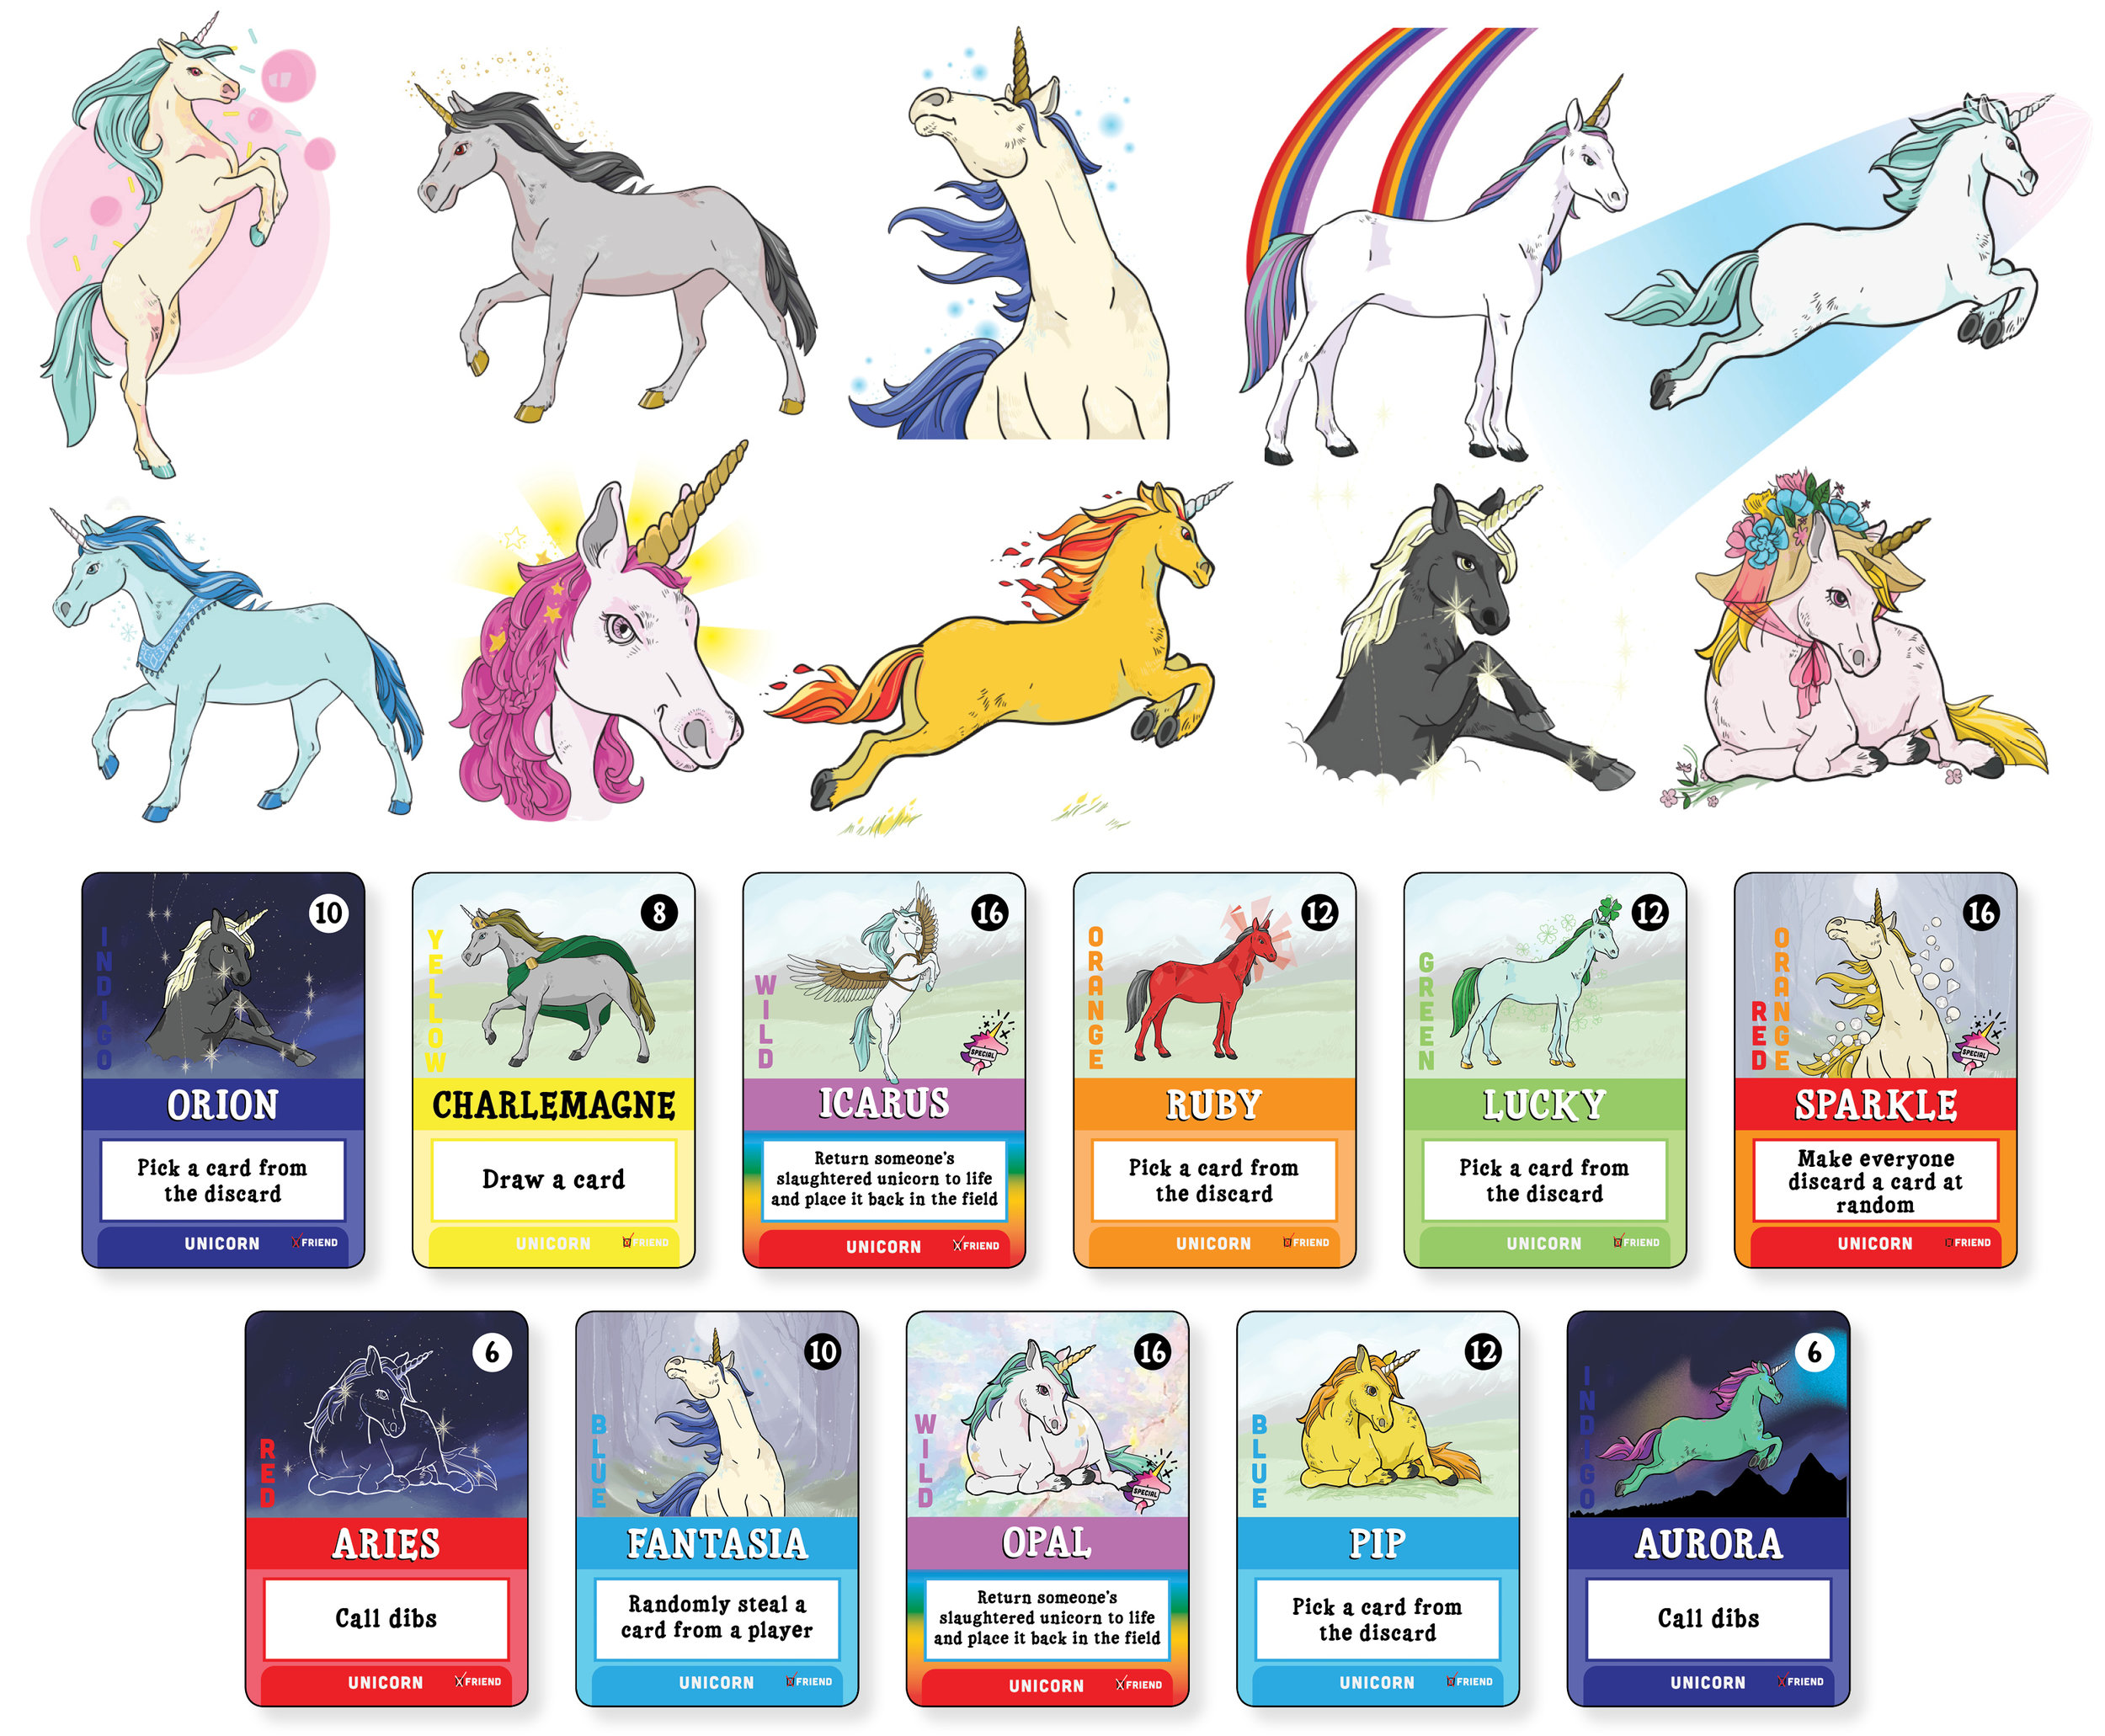 Final artwork for Unicorns Friend or Foe: Friend Edition included 36 styled unicorns.